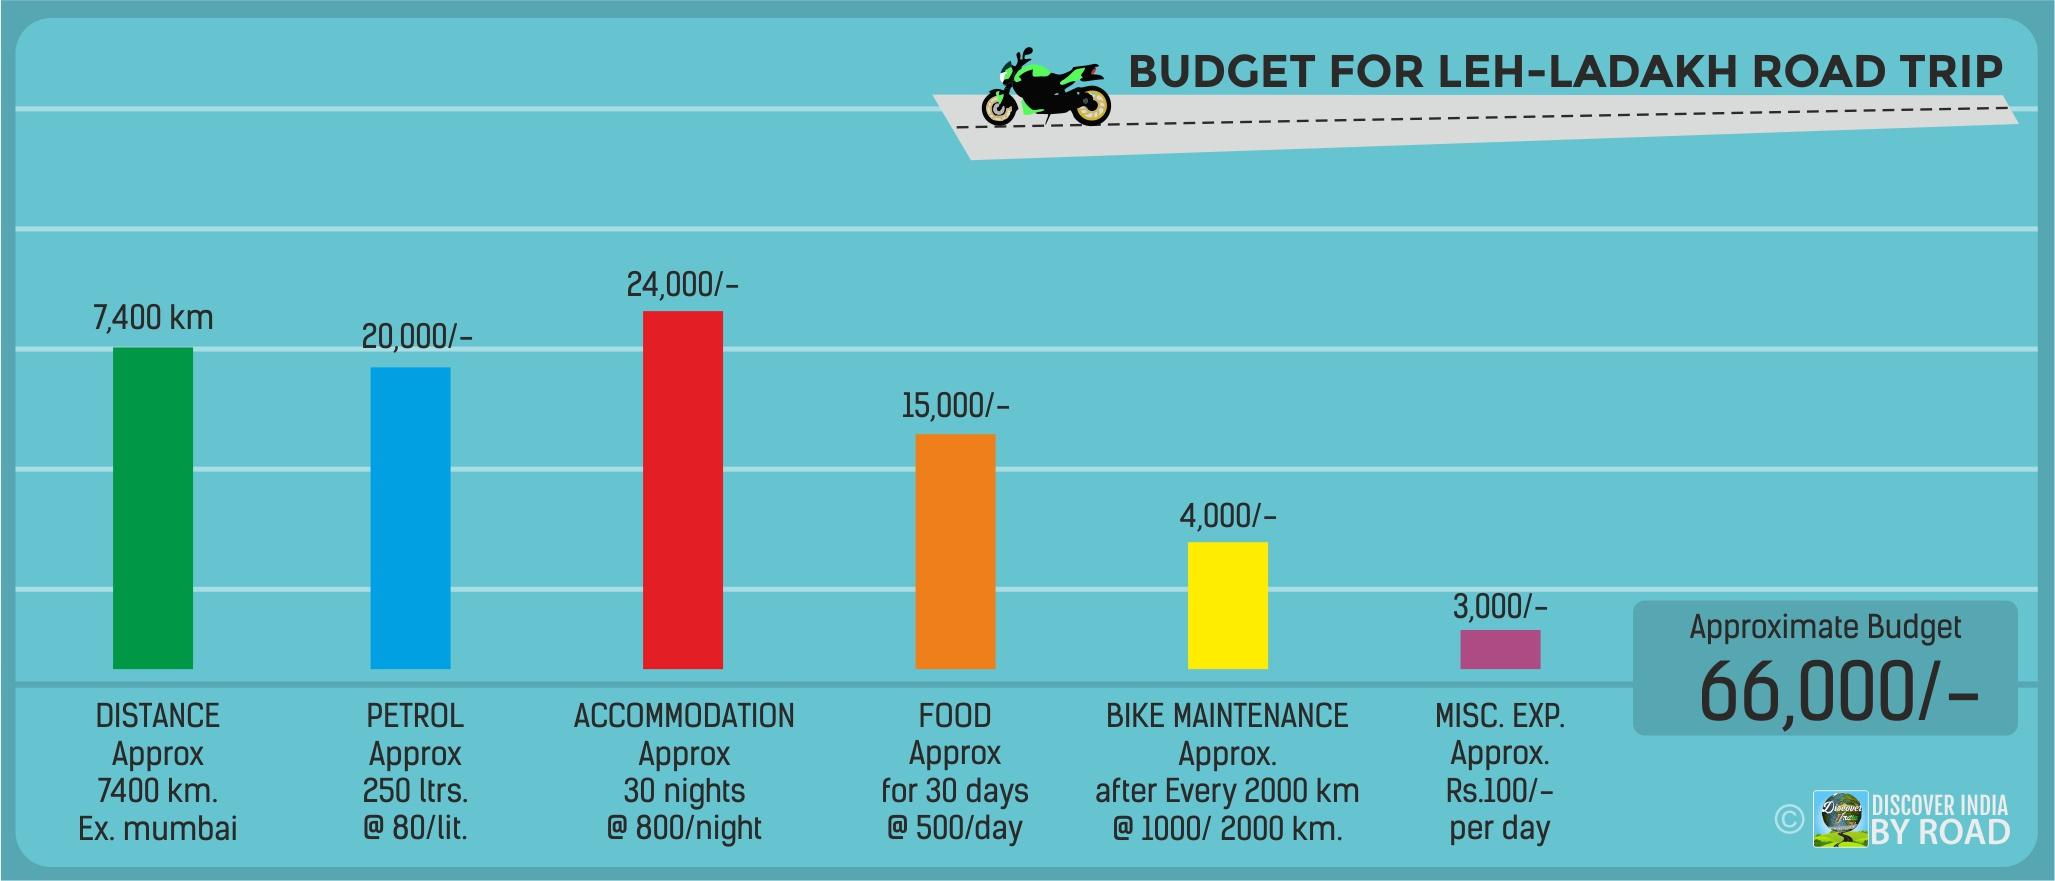 Leh-ladakh road trip budget Chart